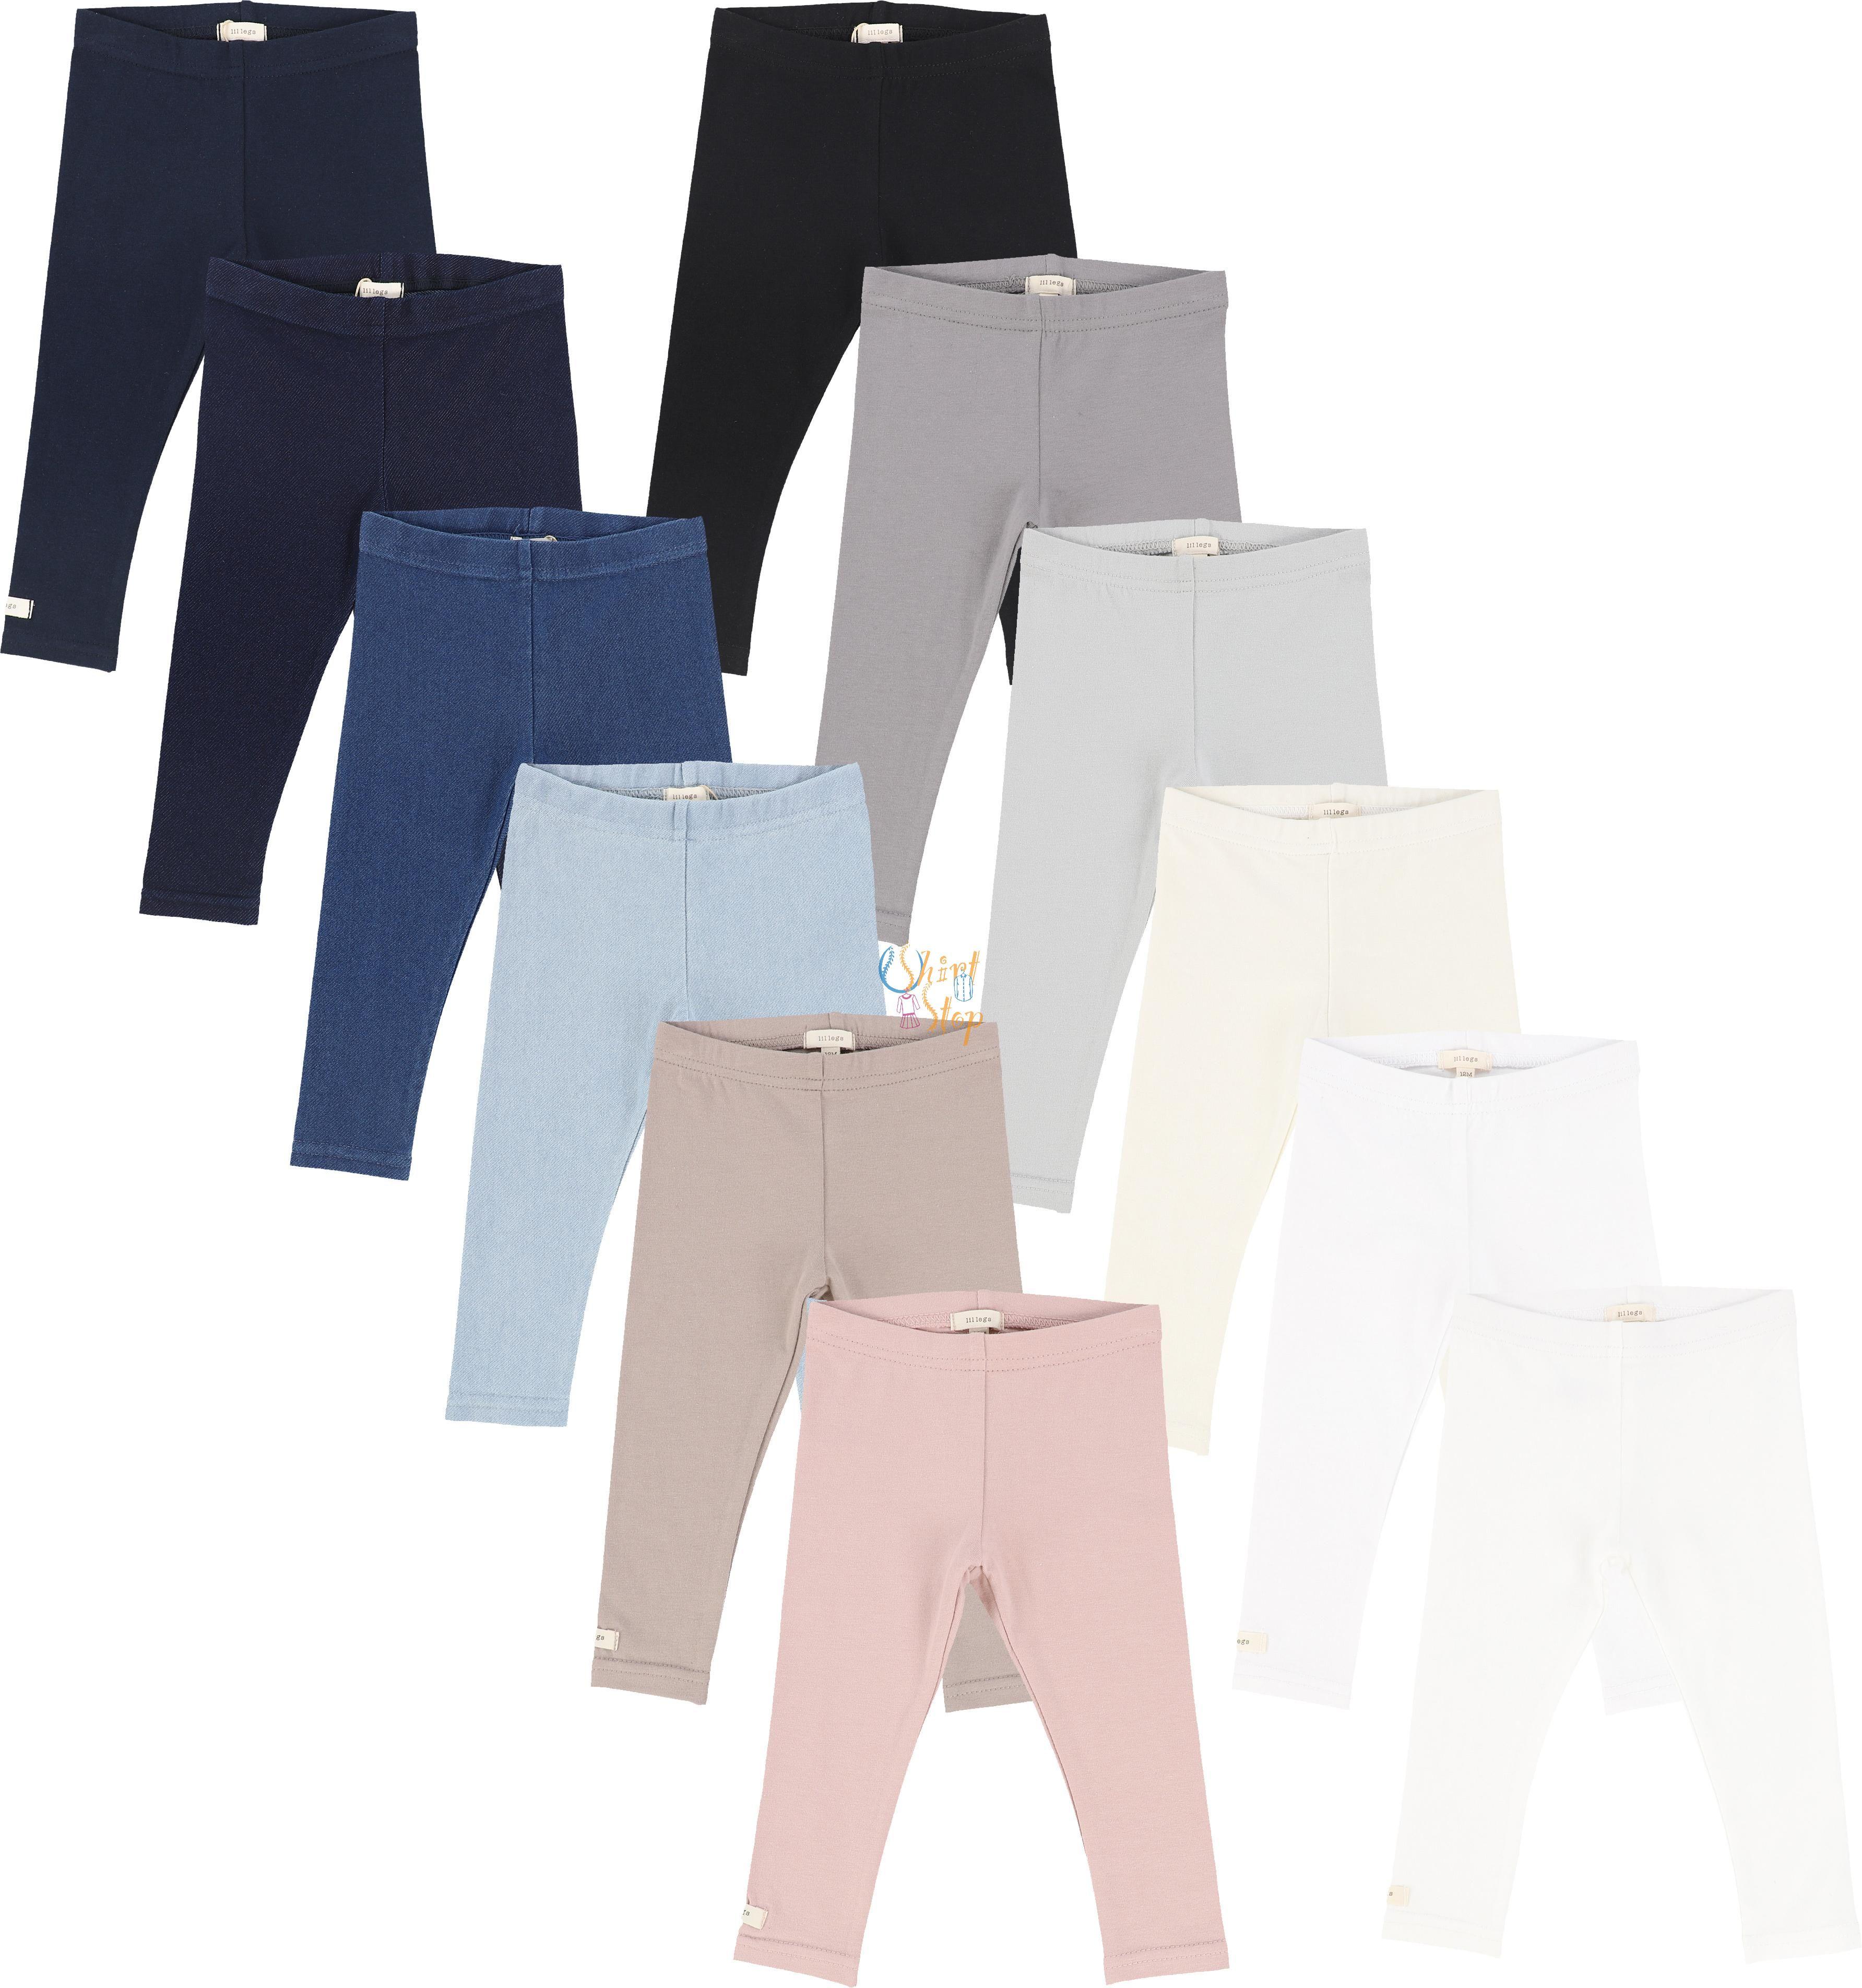 24 Months Lil Legs Unisex Boys Girls Cotton Short Leggings Navy